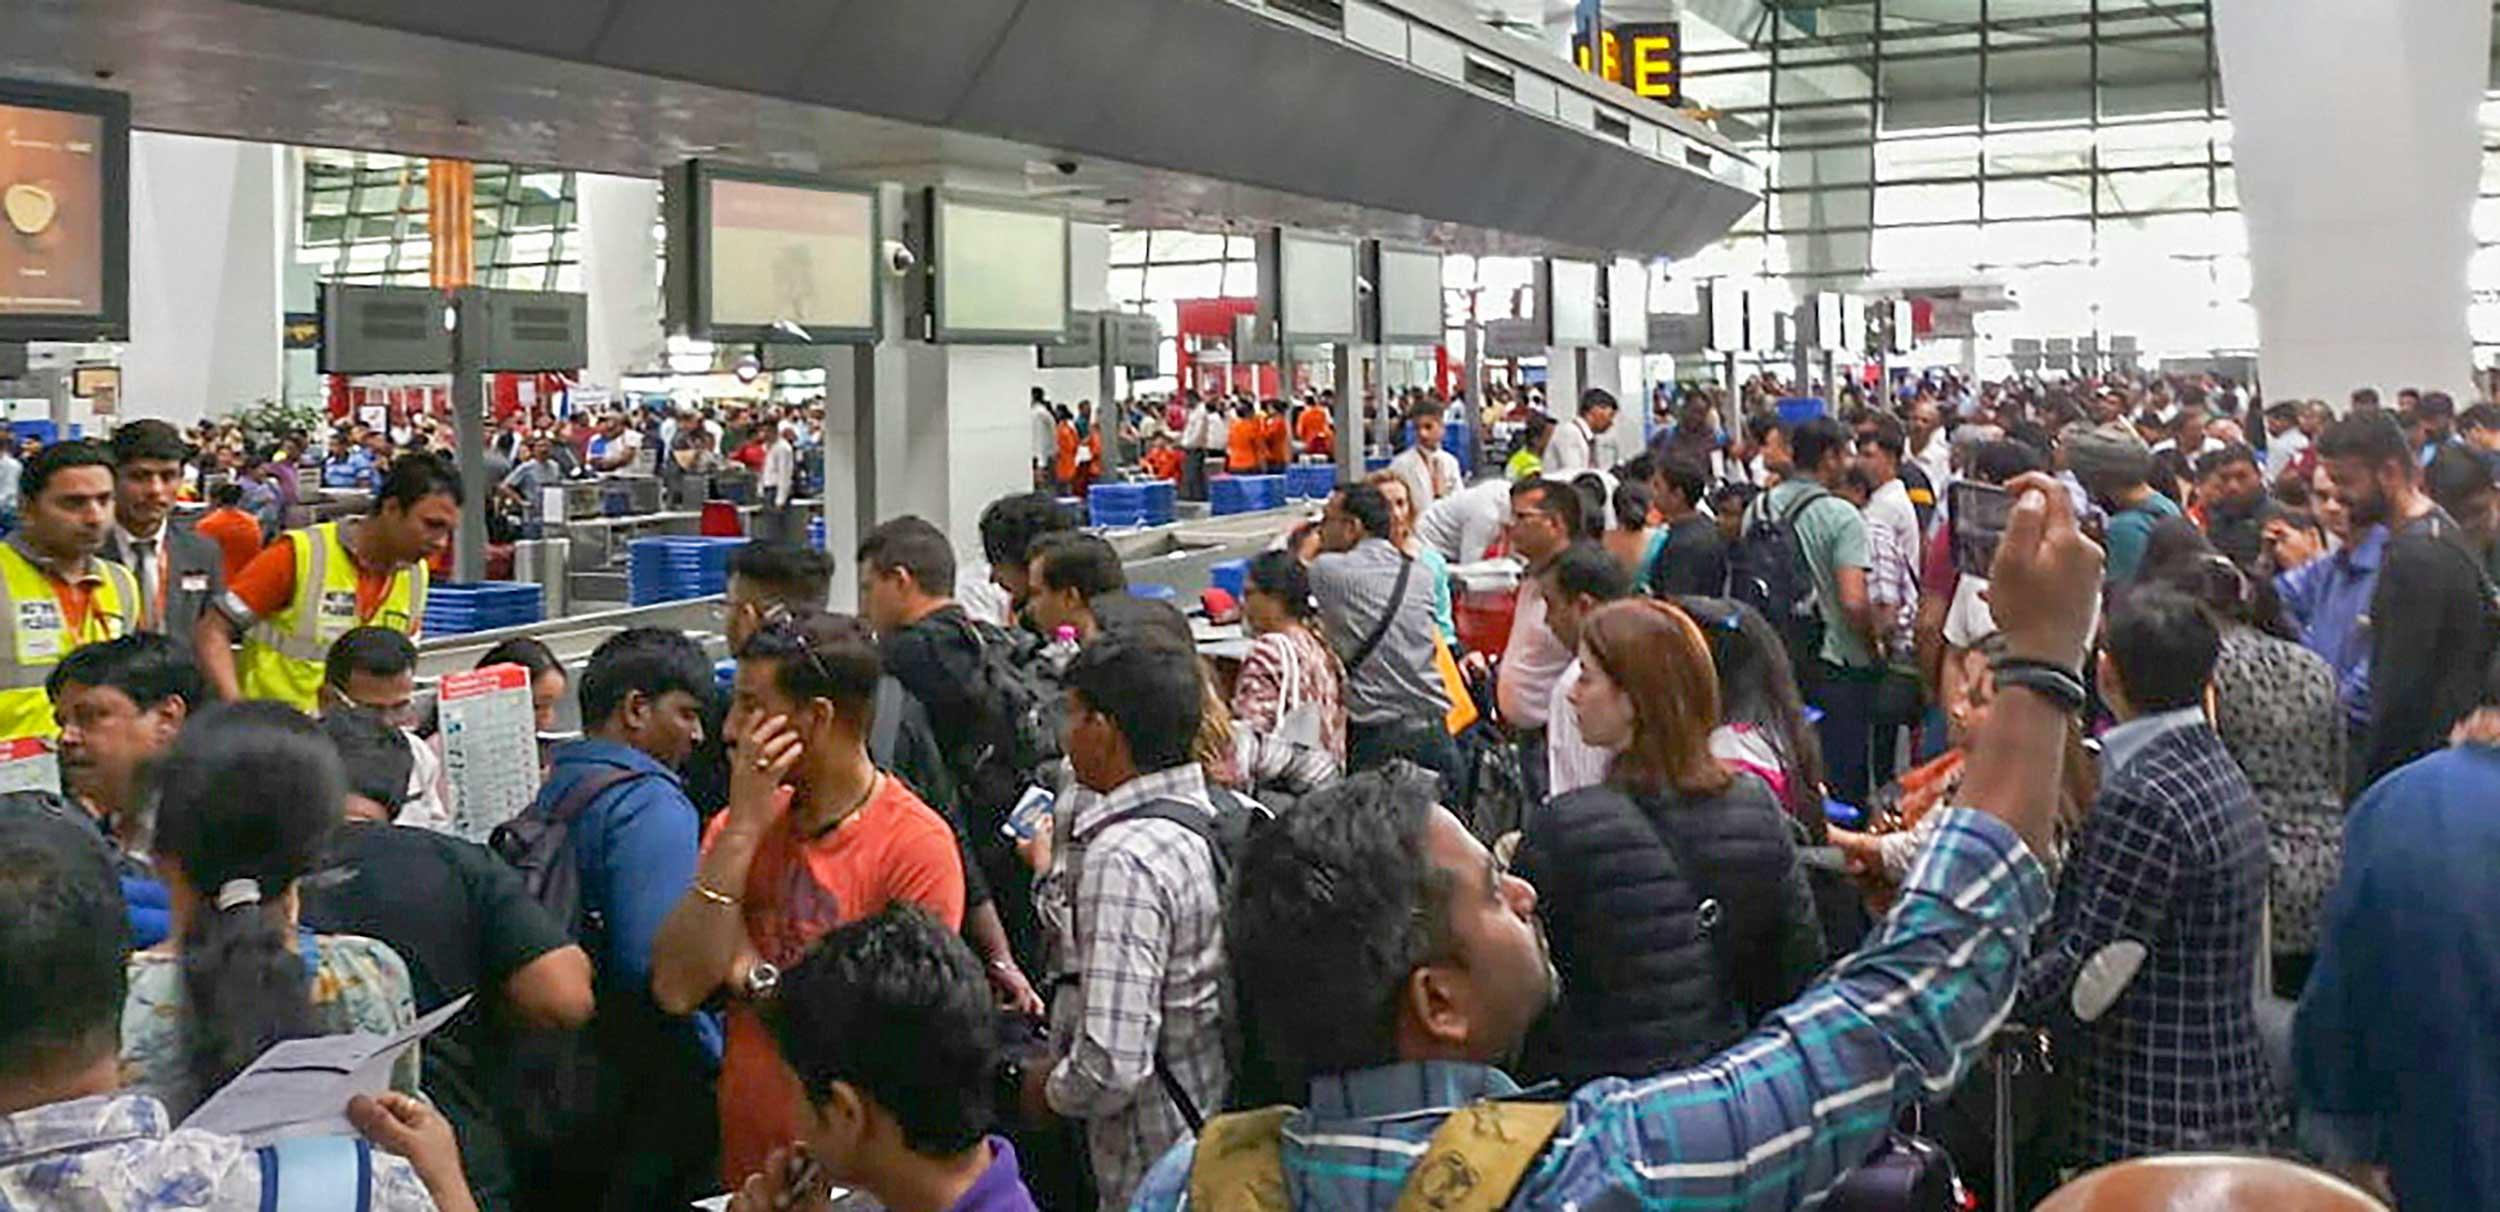 Air India flight passengers stranded at the Indira Gandhi International Airport in New Delhi on April 27, 2019.